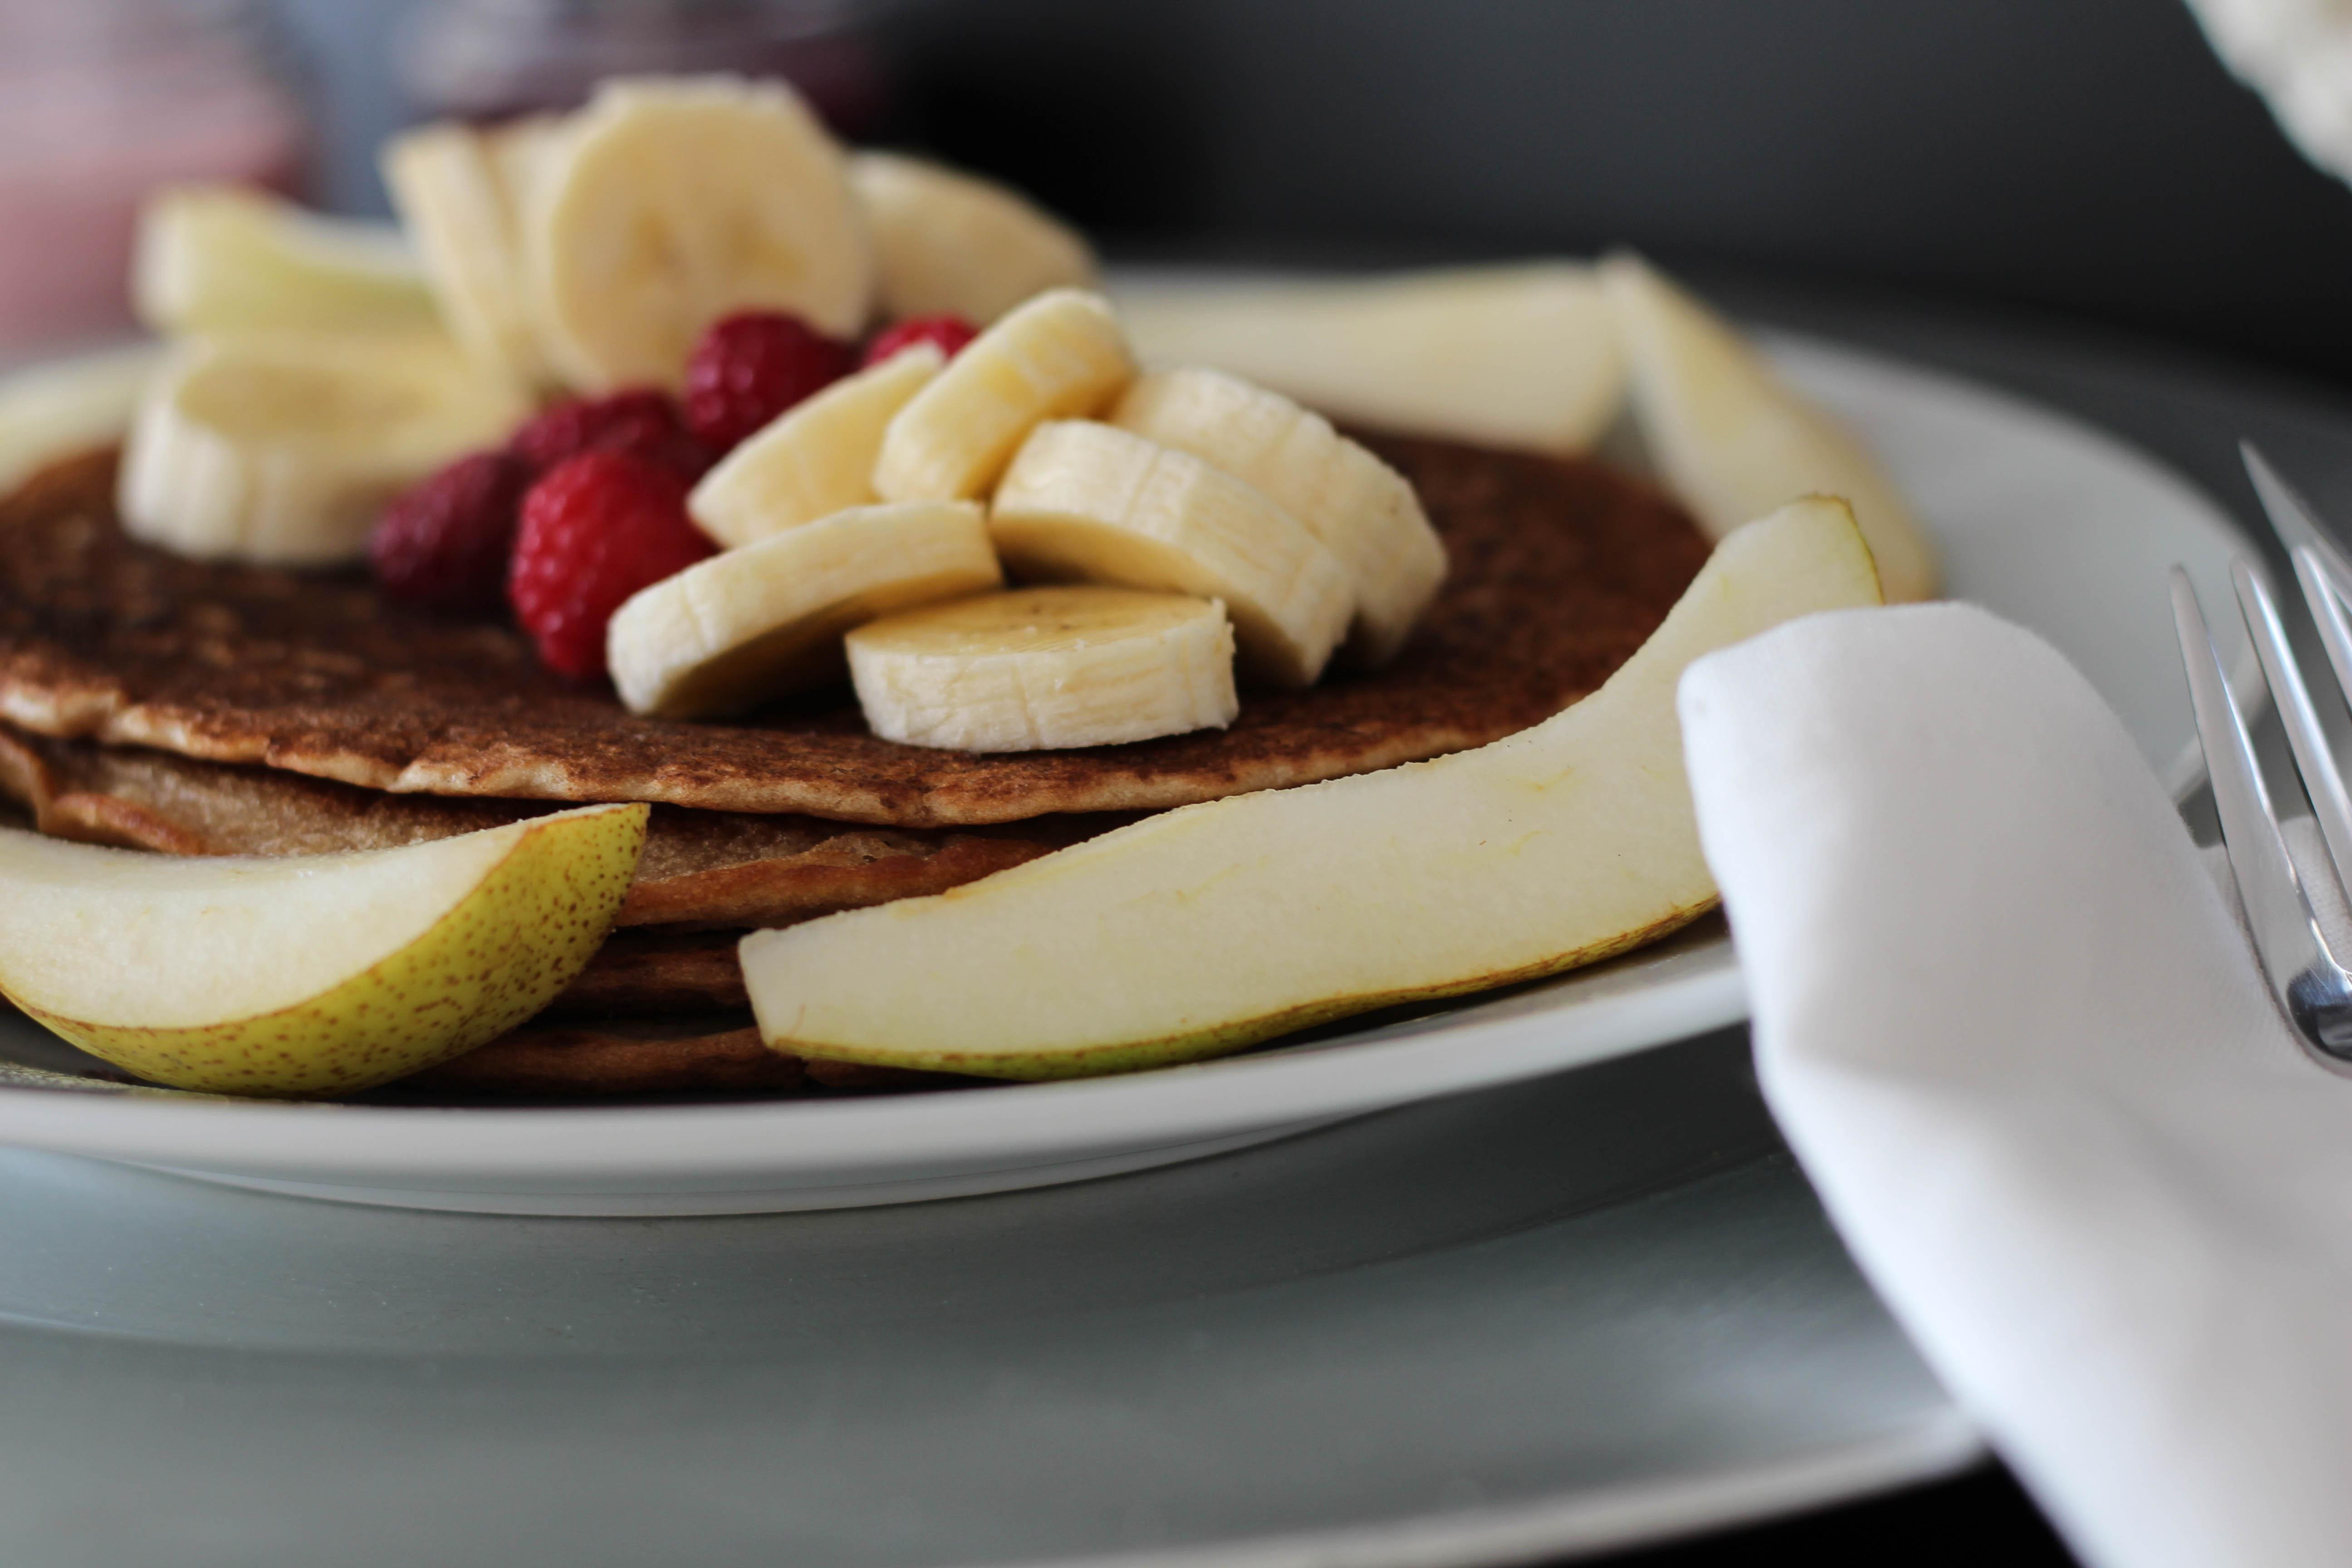 vegan-aroniabeere-pancakes-Buchweizen-homespa-soulfood-healthy-austria